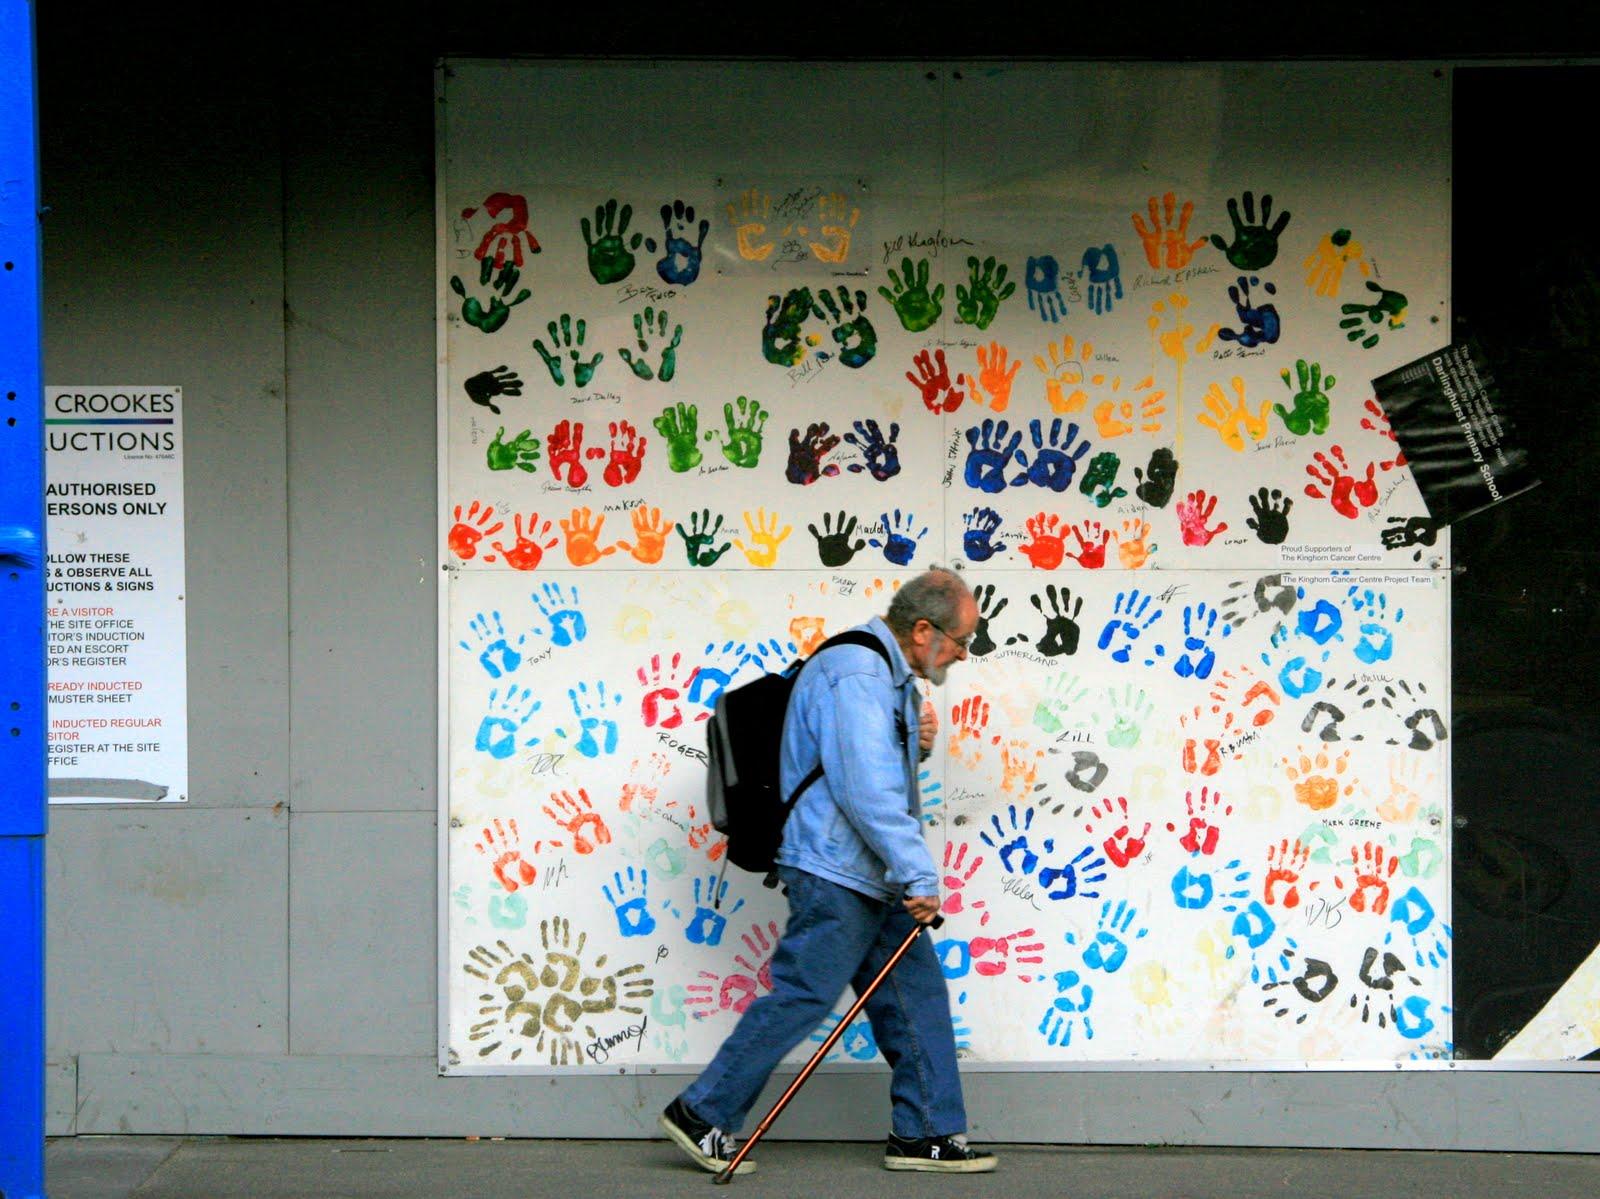 Sydney Eye: Helping hands, healing hands